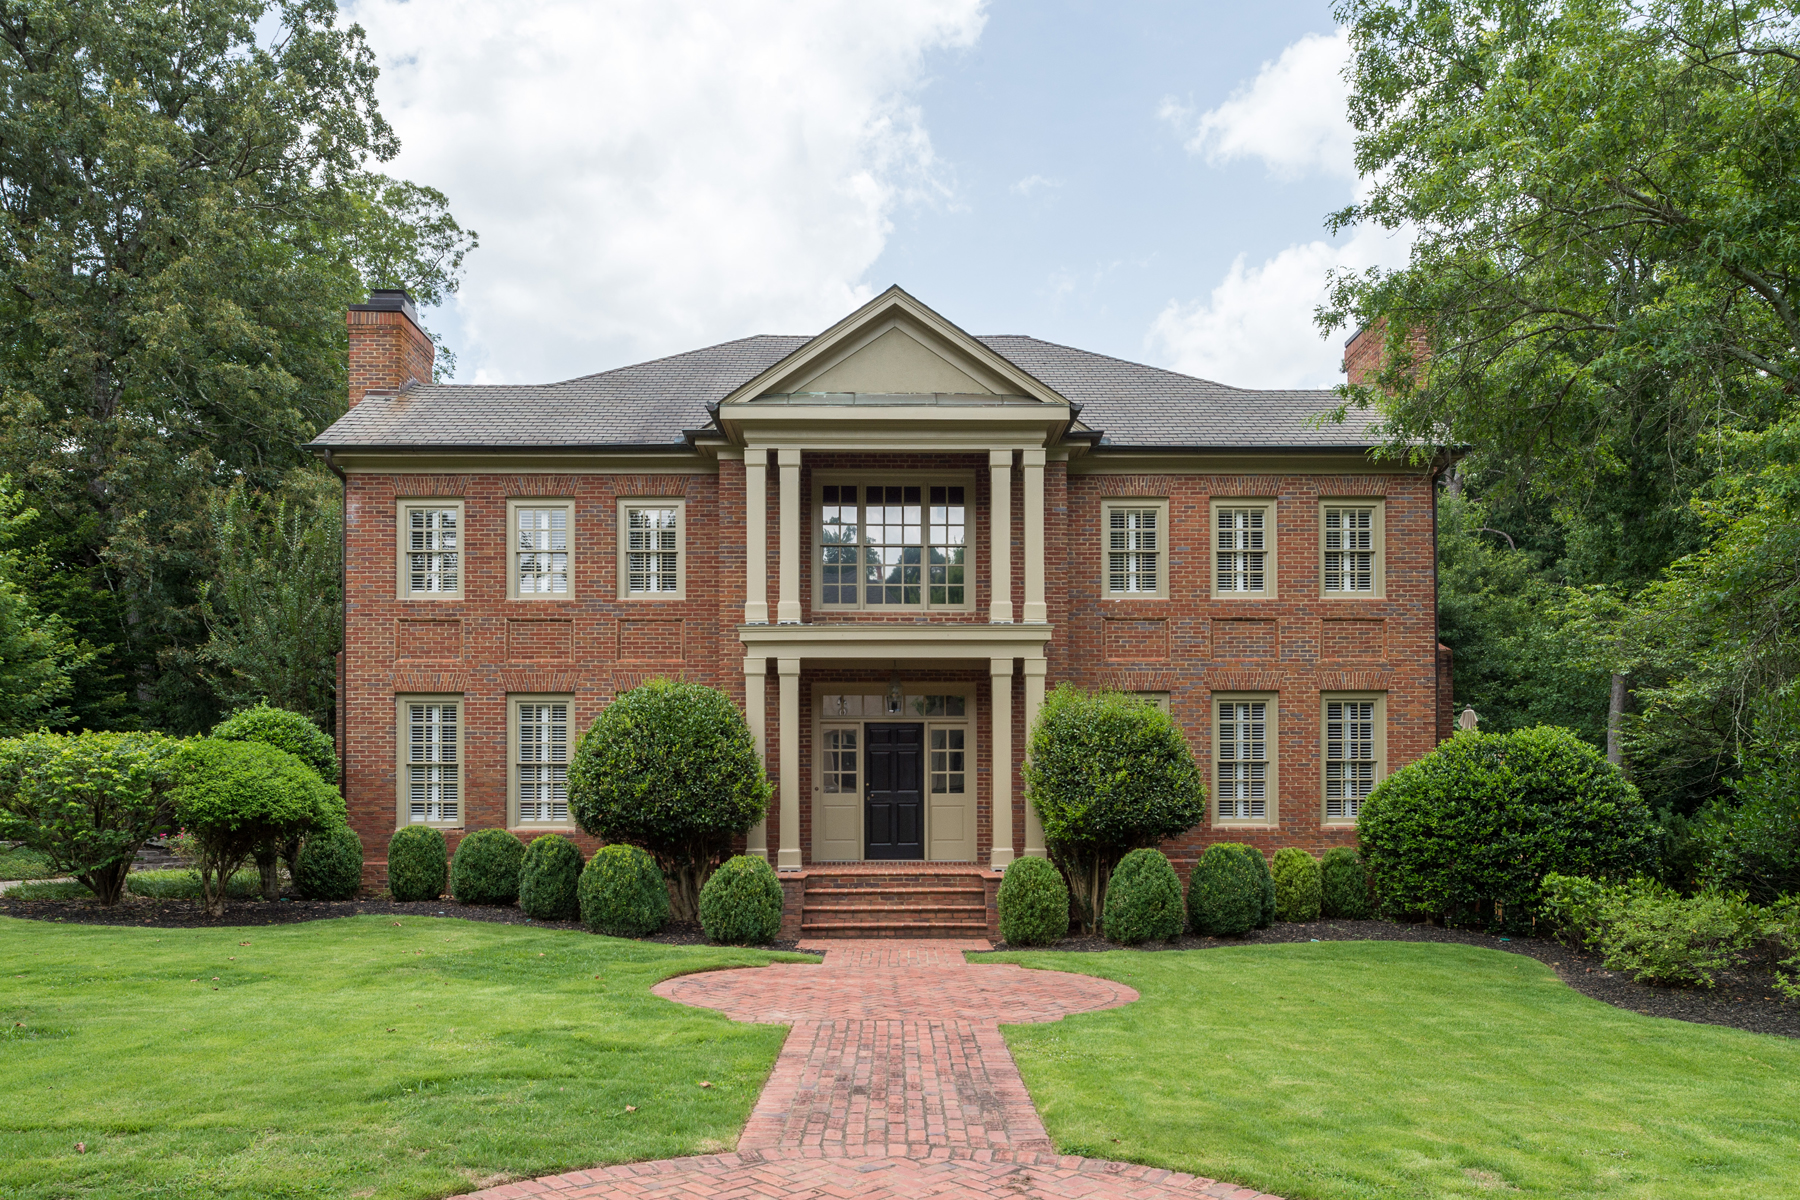 Single Family Home for Sale at Sophisticated Georgian Brick 1520 Stonegate Way Buckhead, Atlanta, Georgia 30327 United States